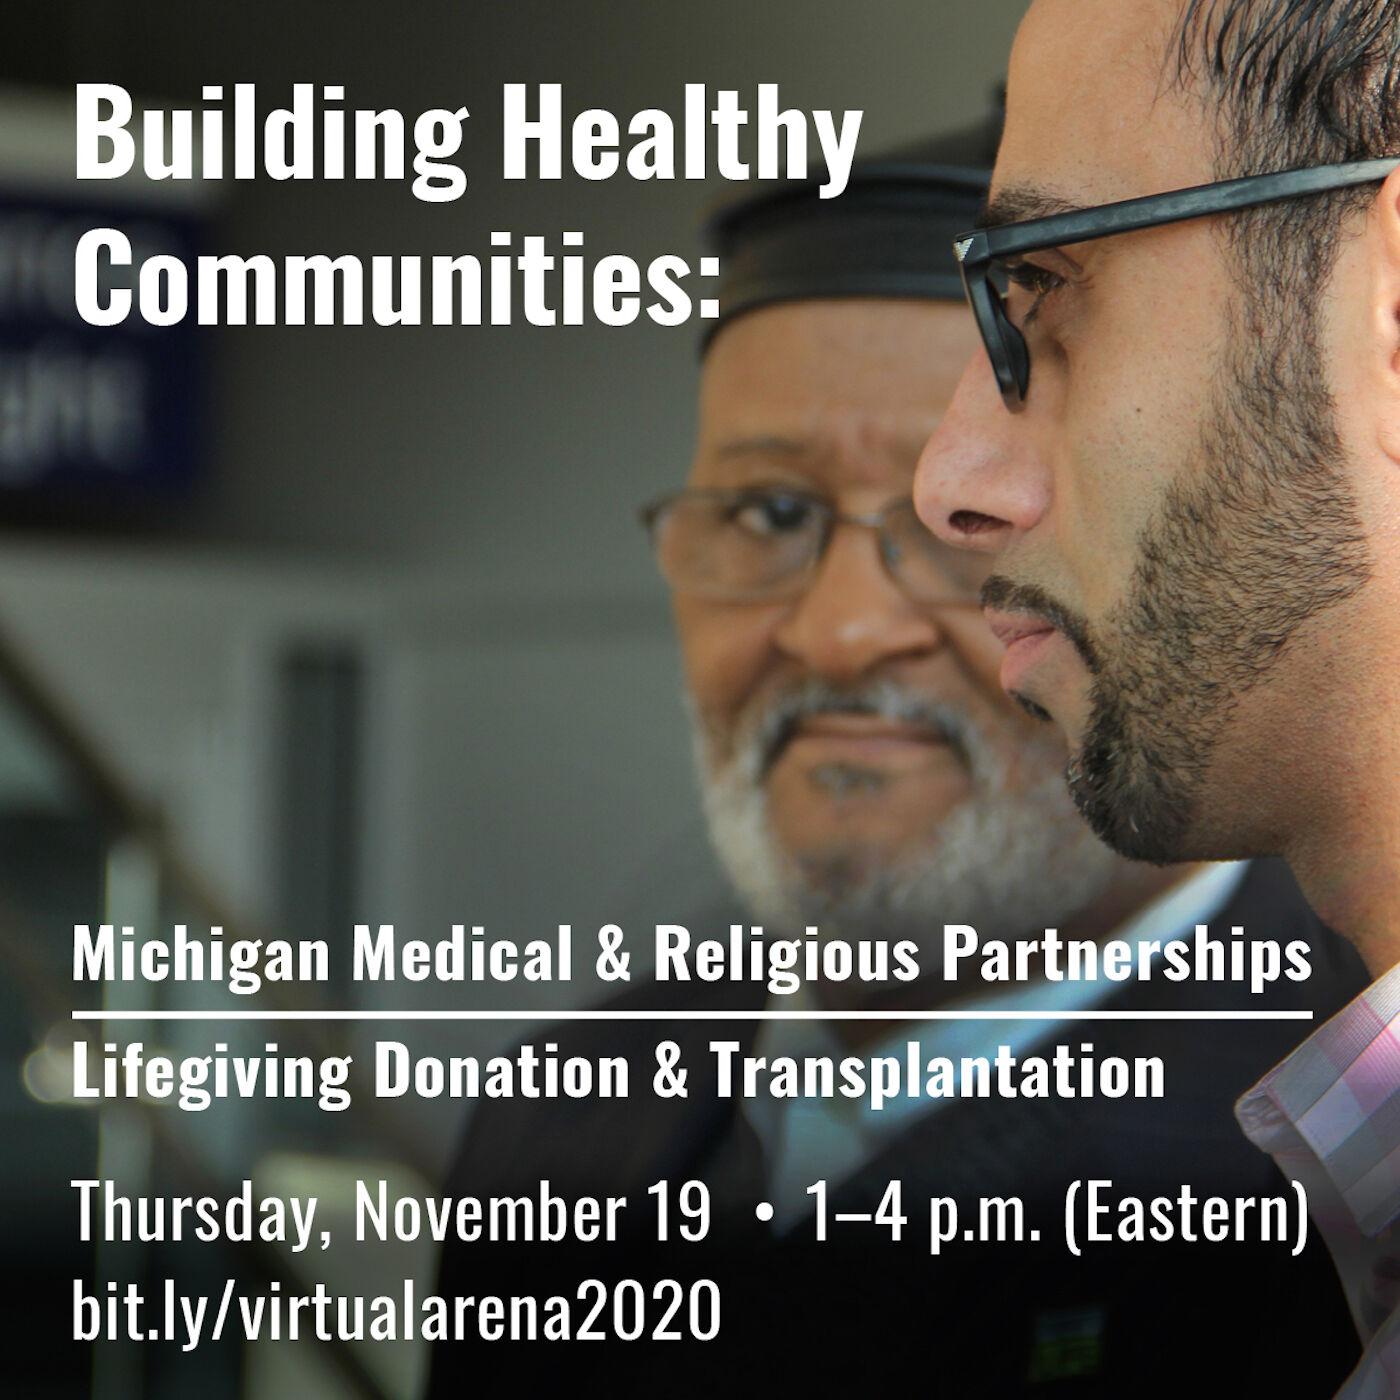 Building Healthy Communities: Michigan Medical & Religious Partnerships | Life-giving Donation & Transplantation Panel 1